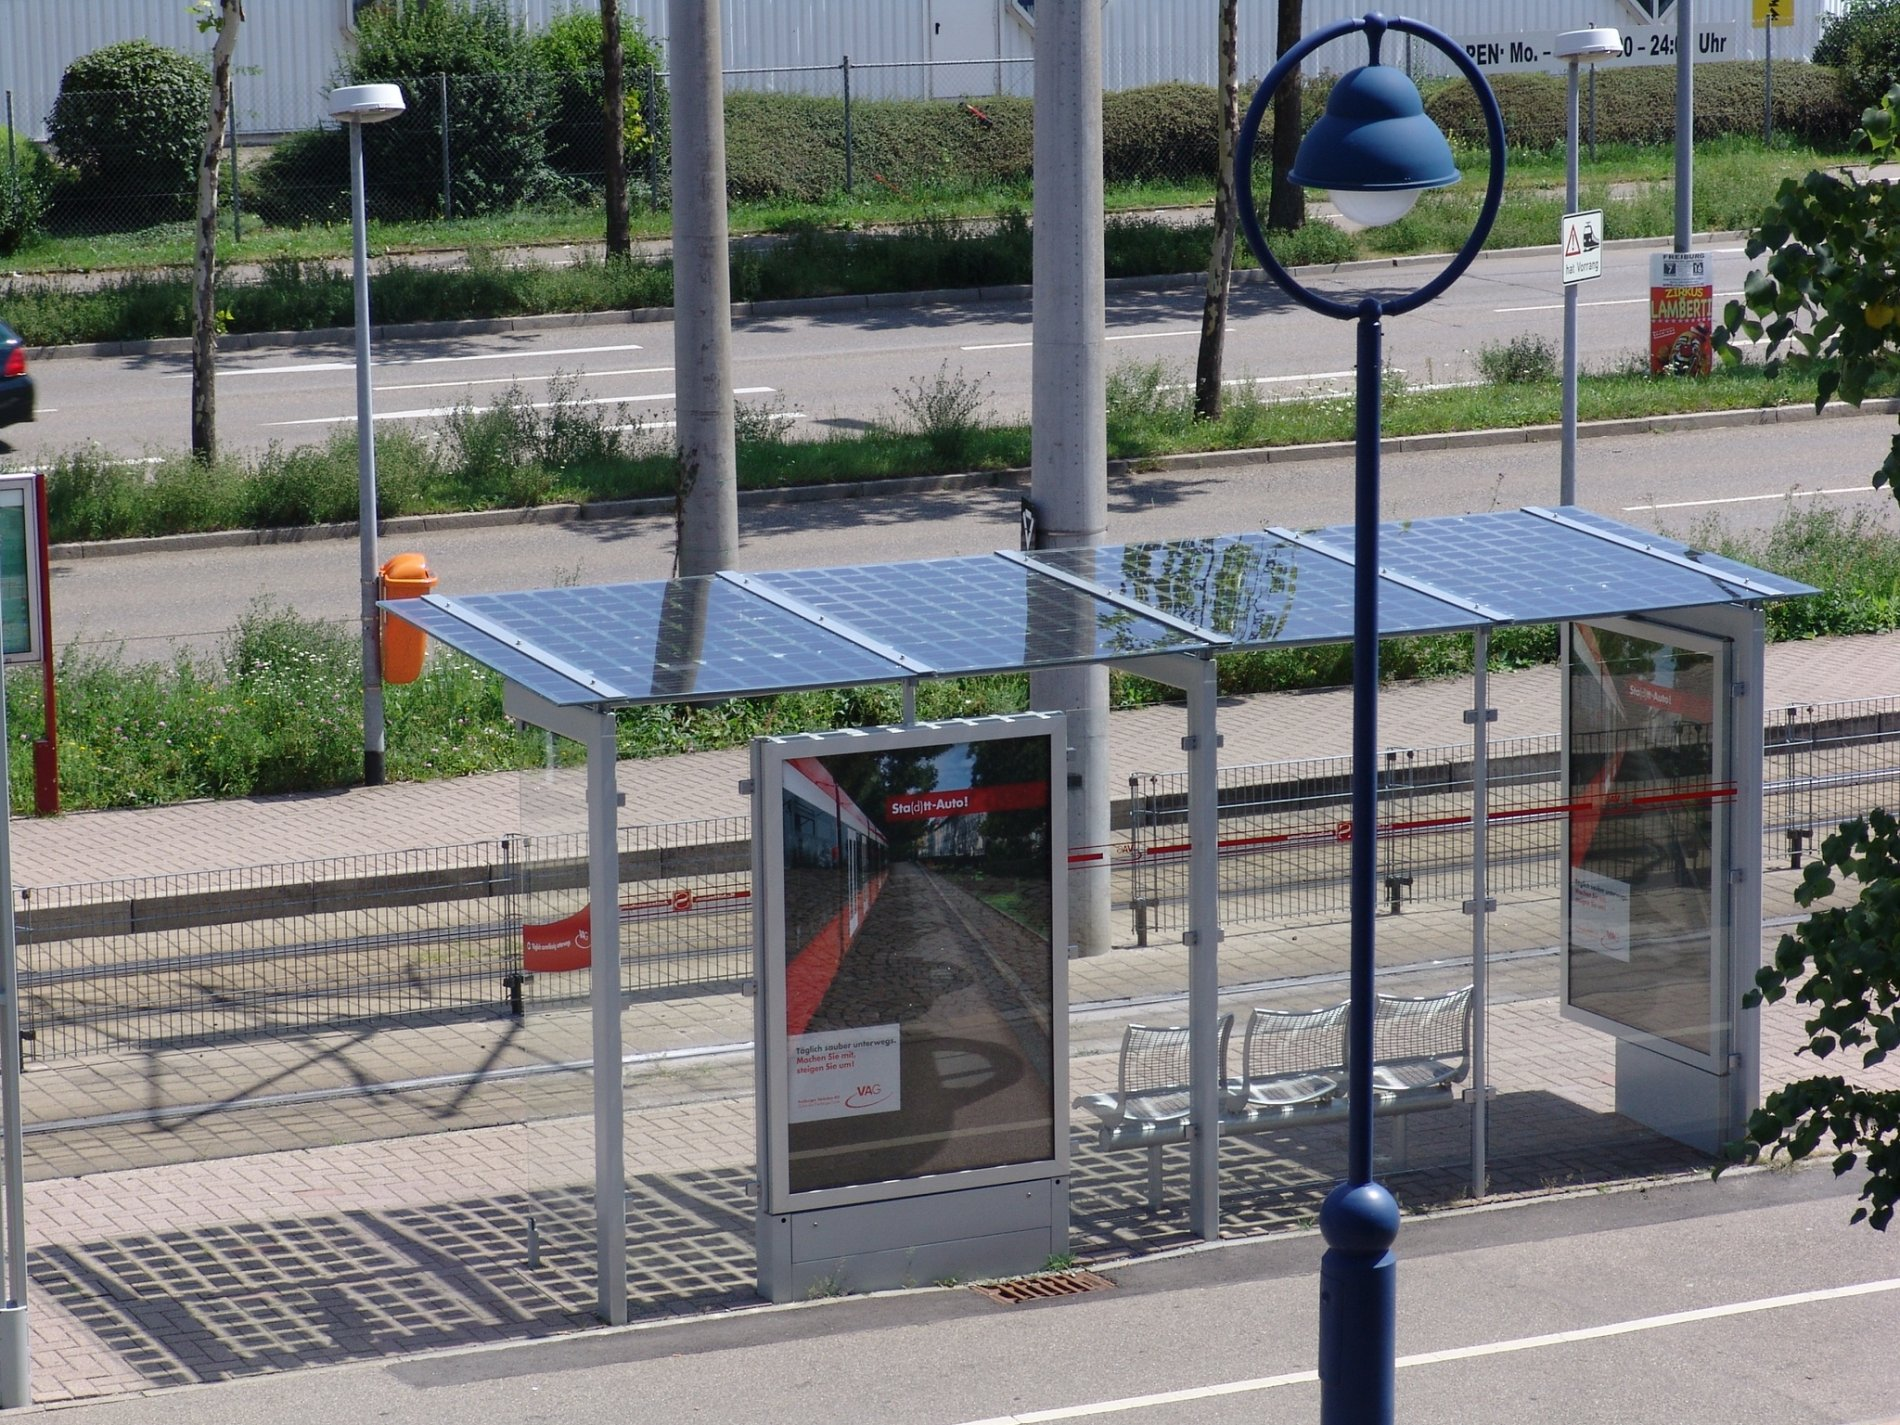 Solardachhaltestelle